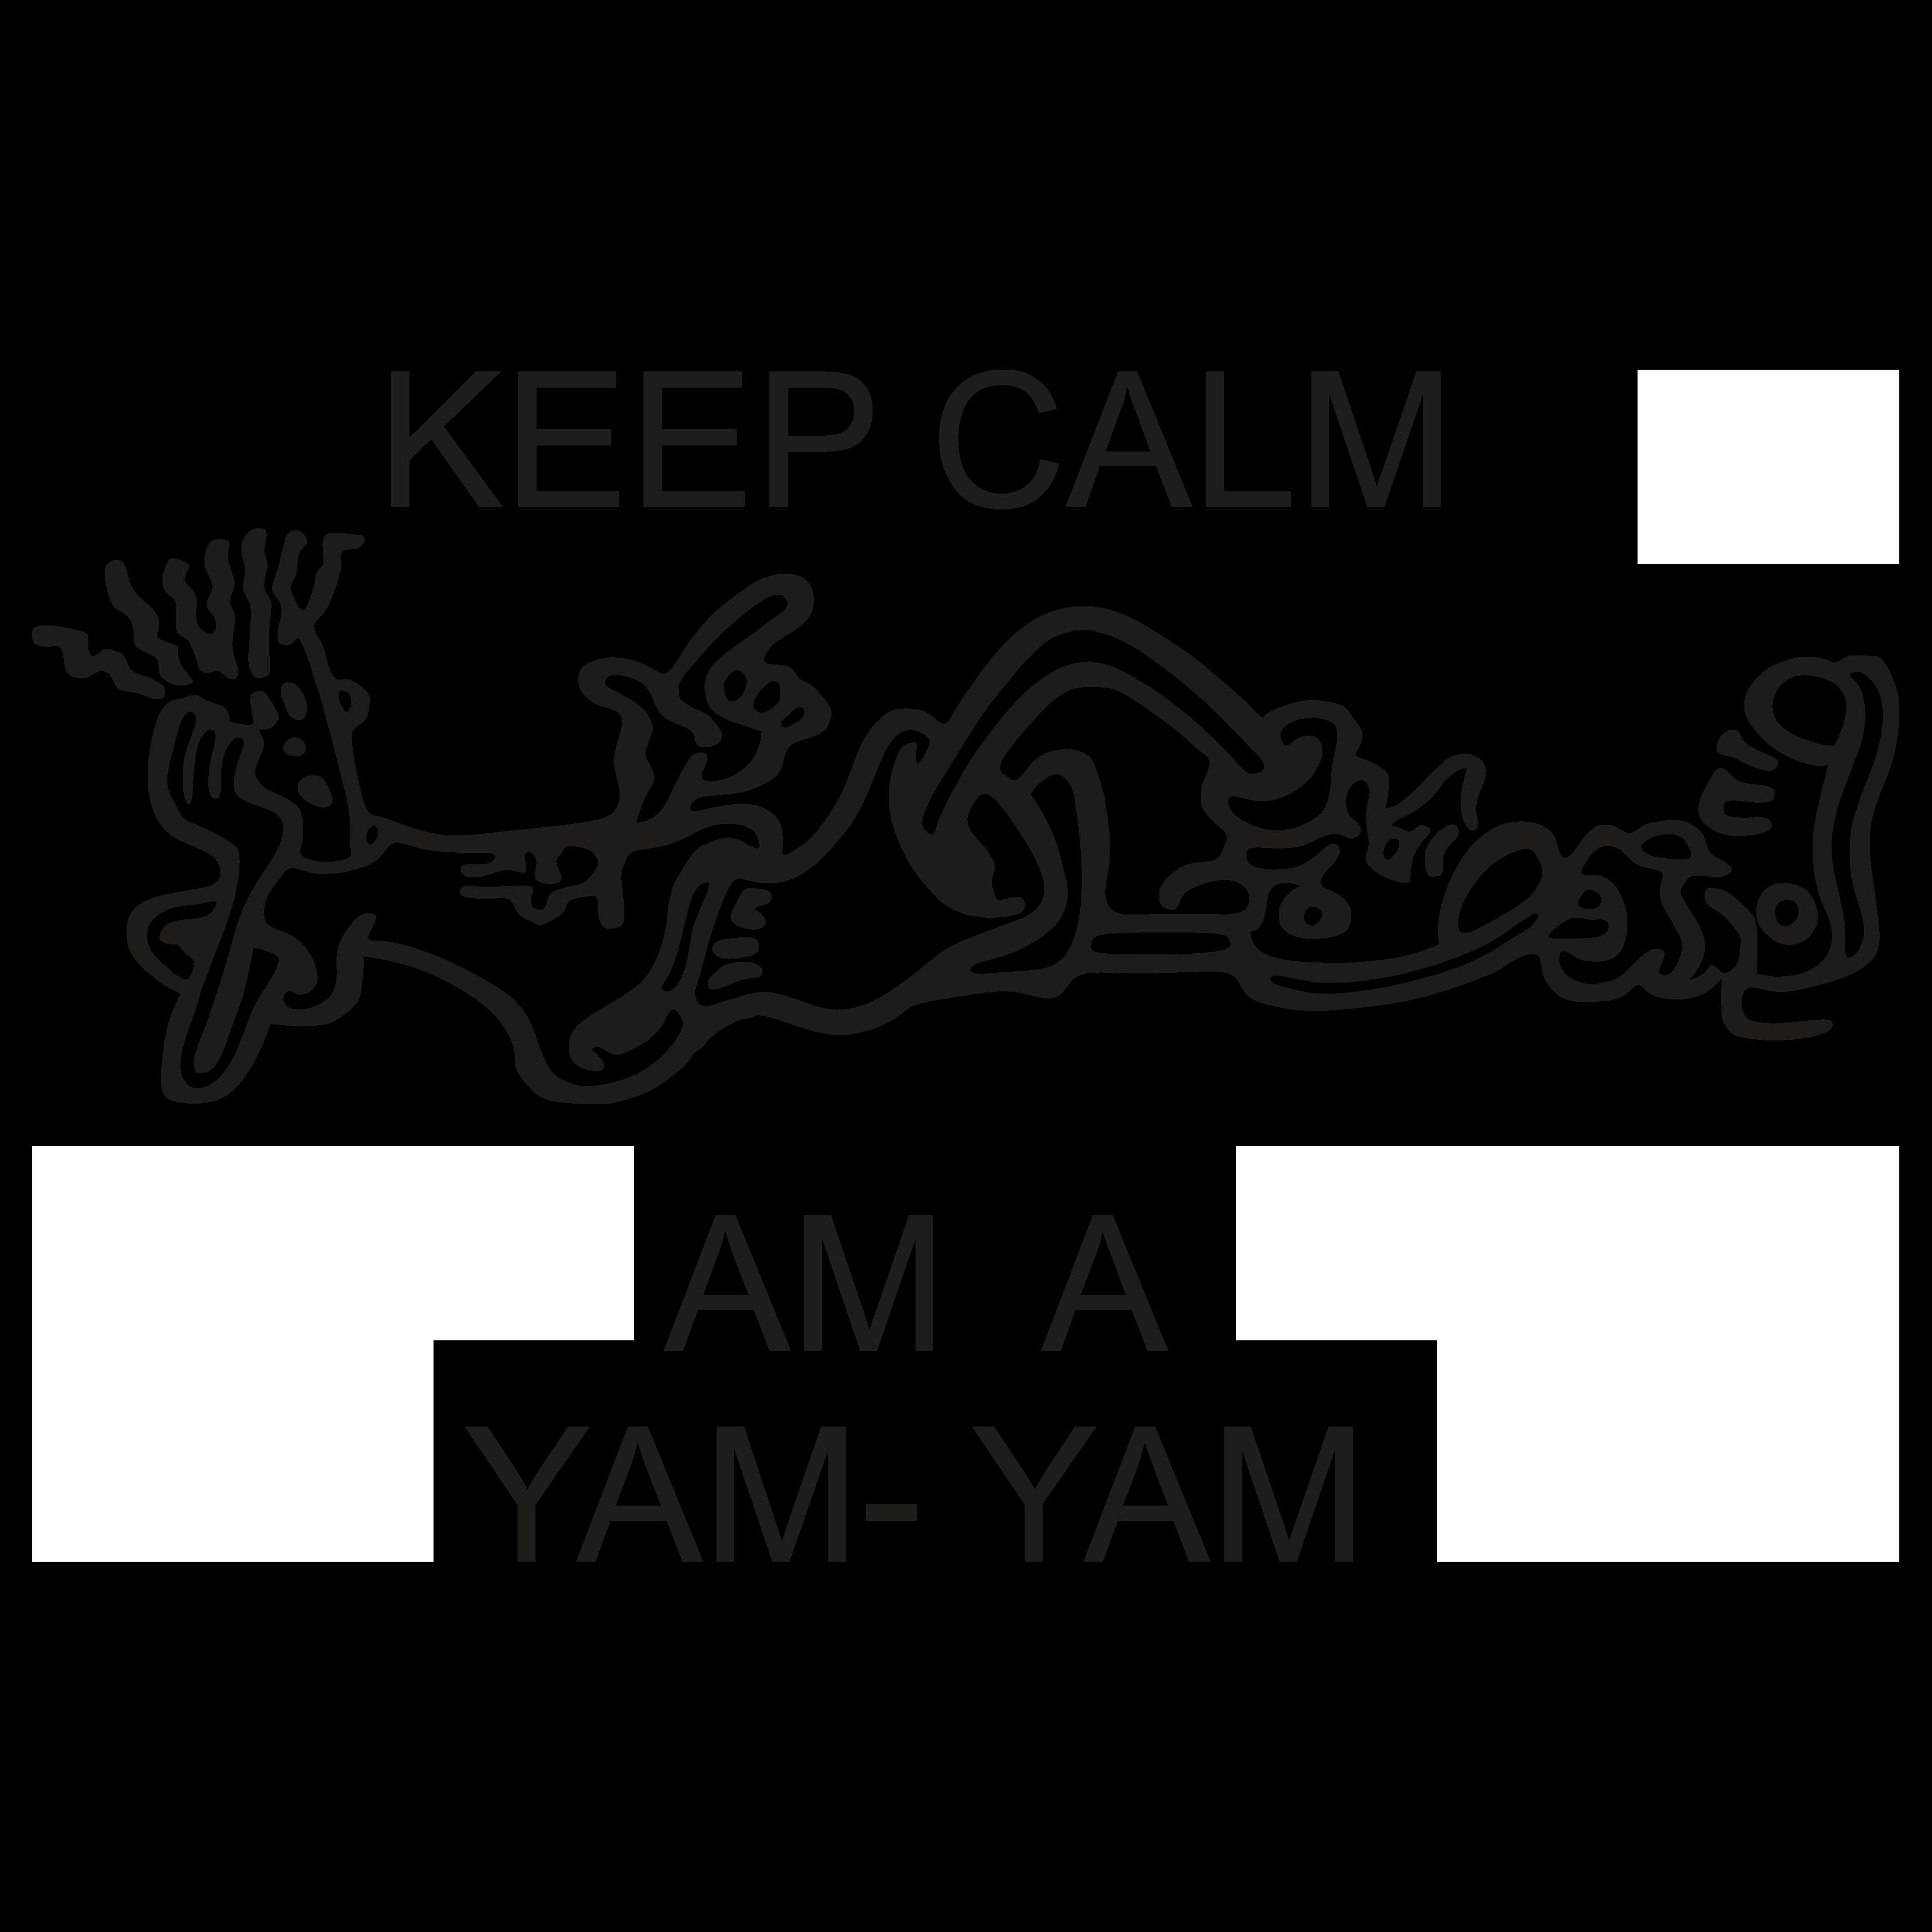 BLC005 - Keep Calm Am A Yam Yam